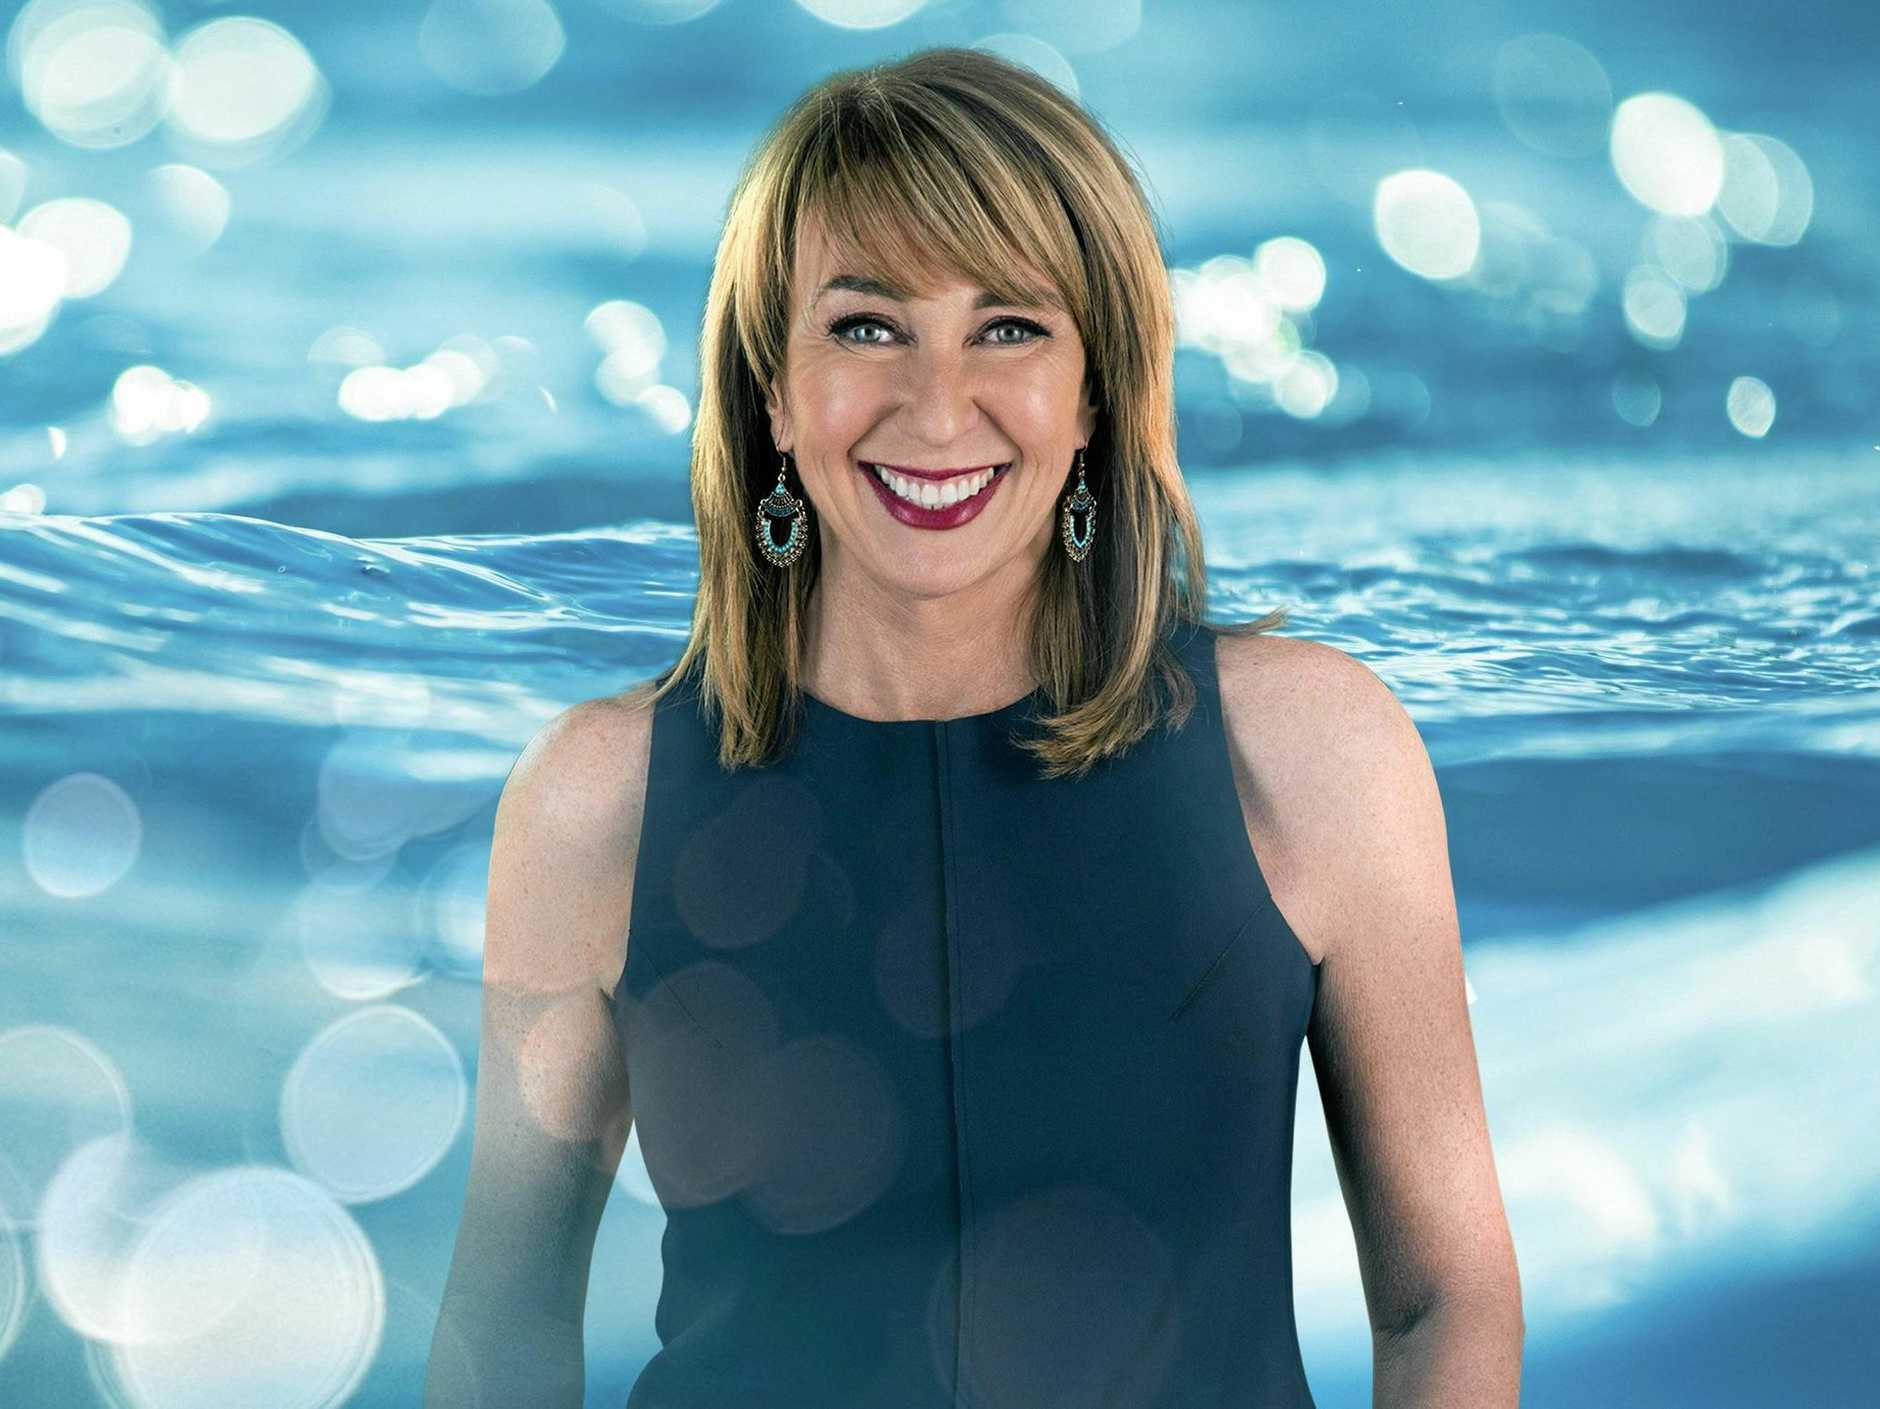 Maeve O'Meara hosts the TV series Food Safari Water.